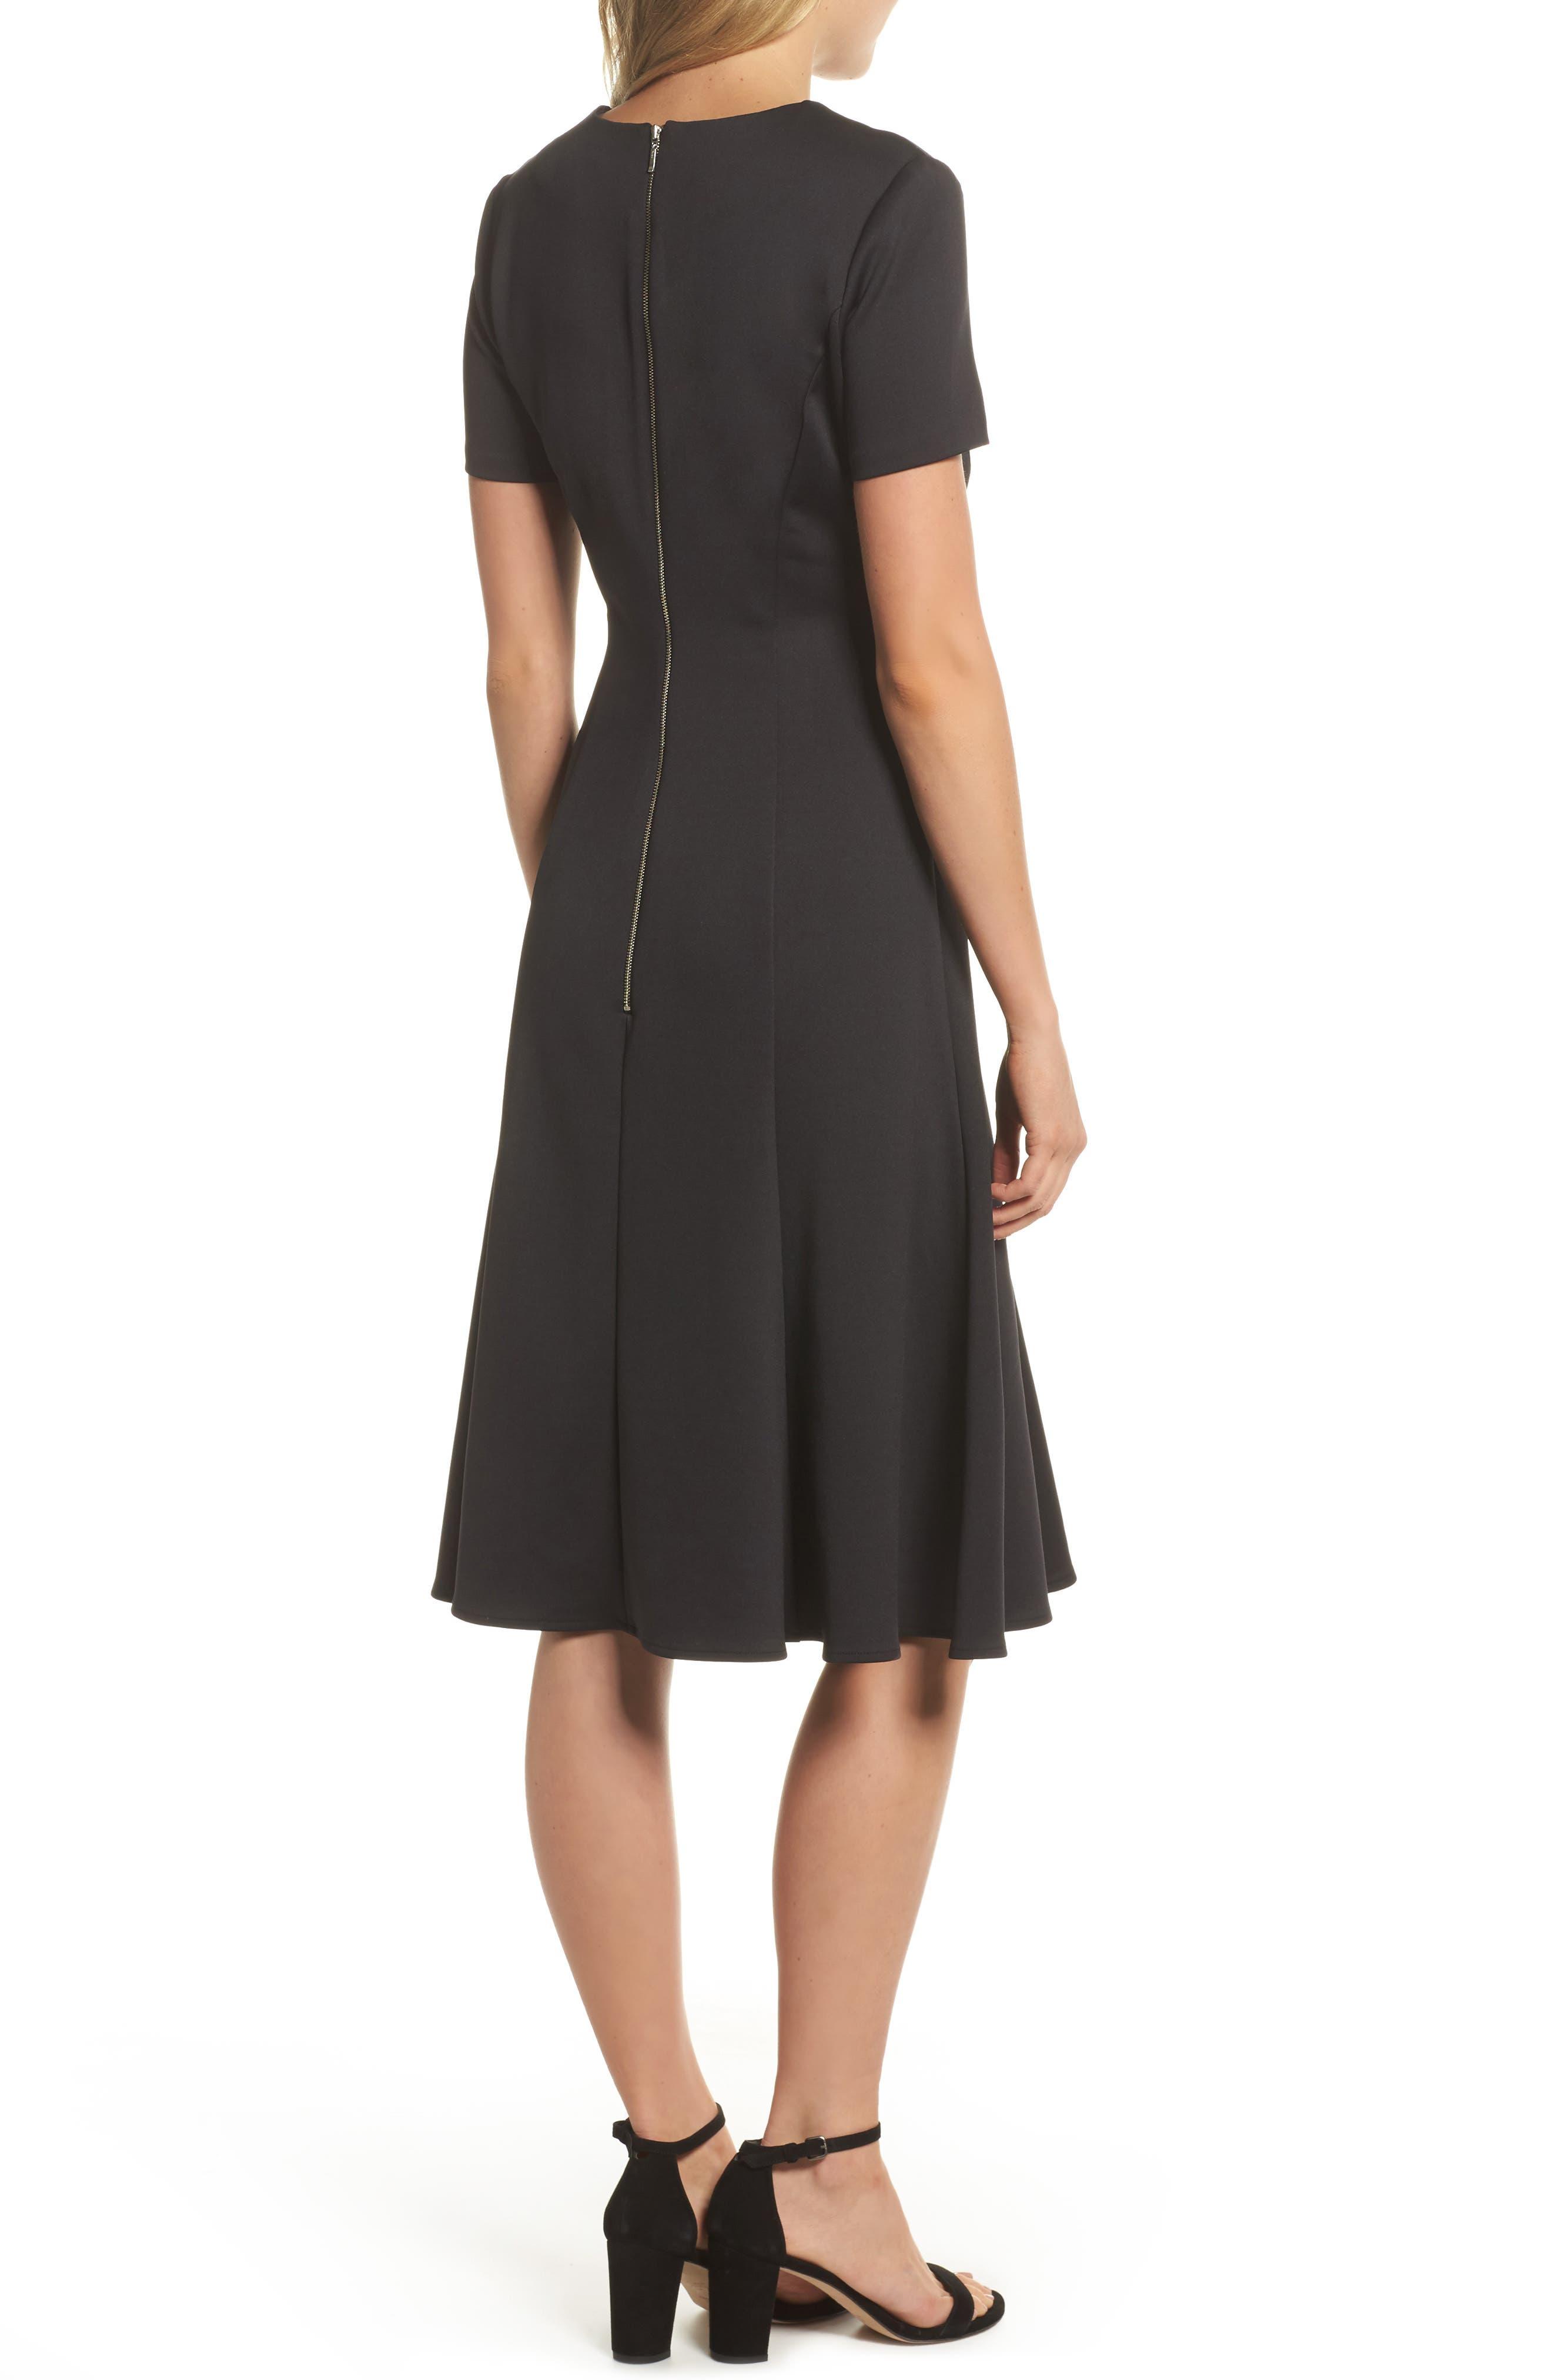 Midi Bell Dress,                             Alternate thumbnail 2, color,                             001